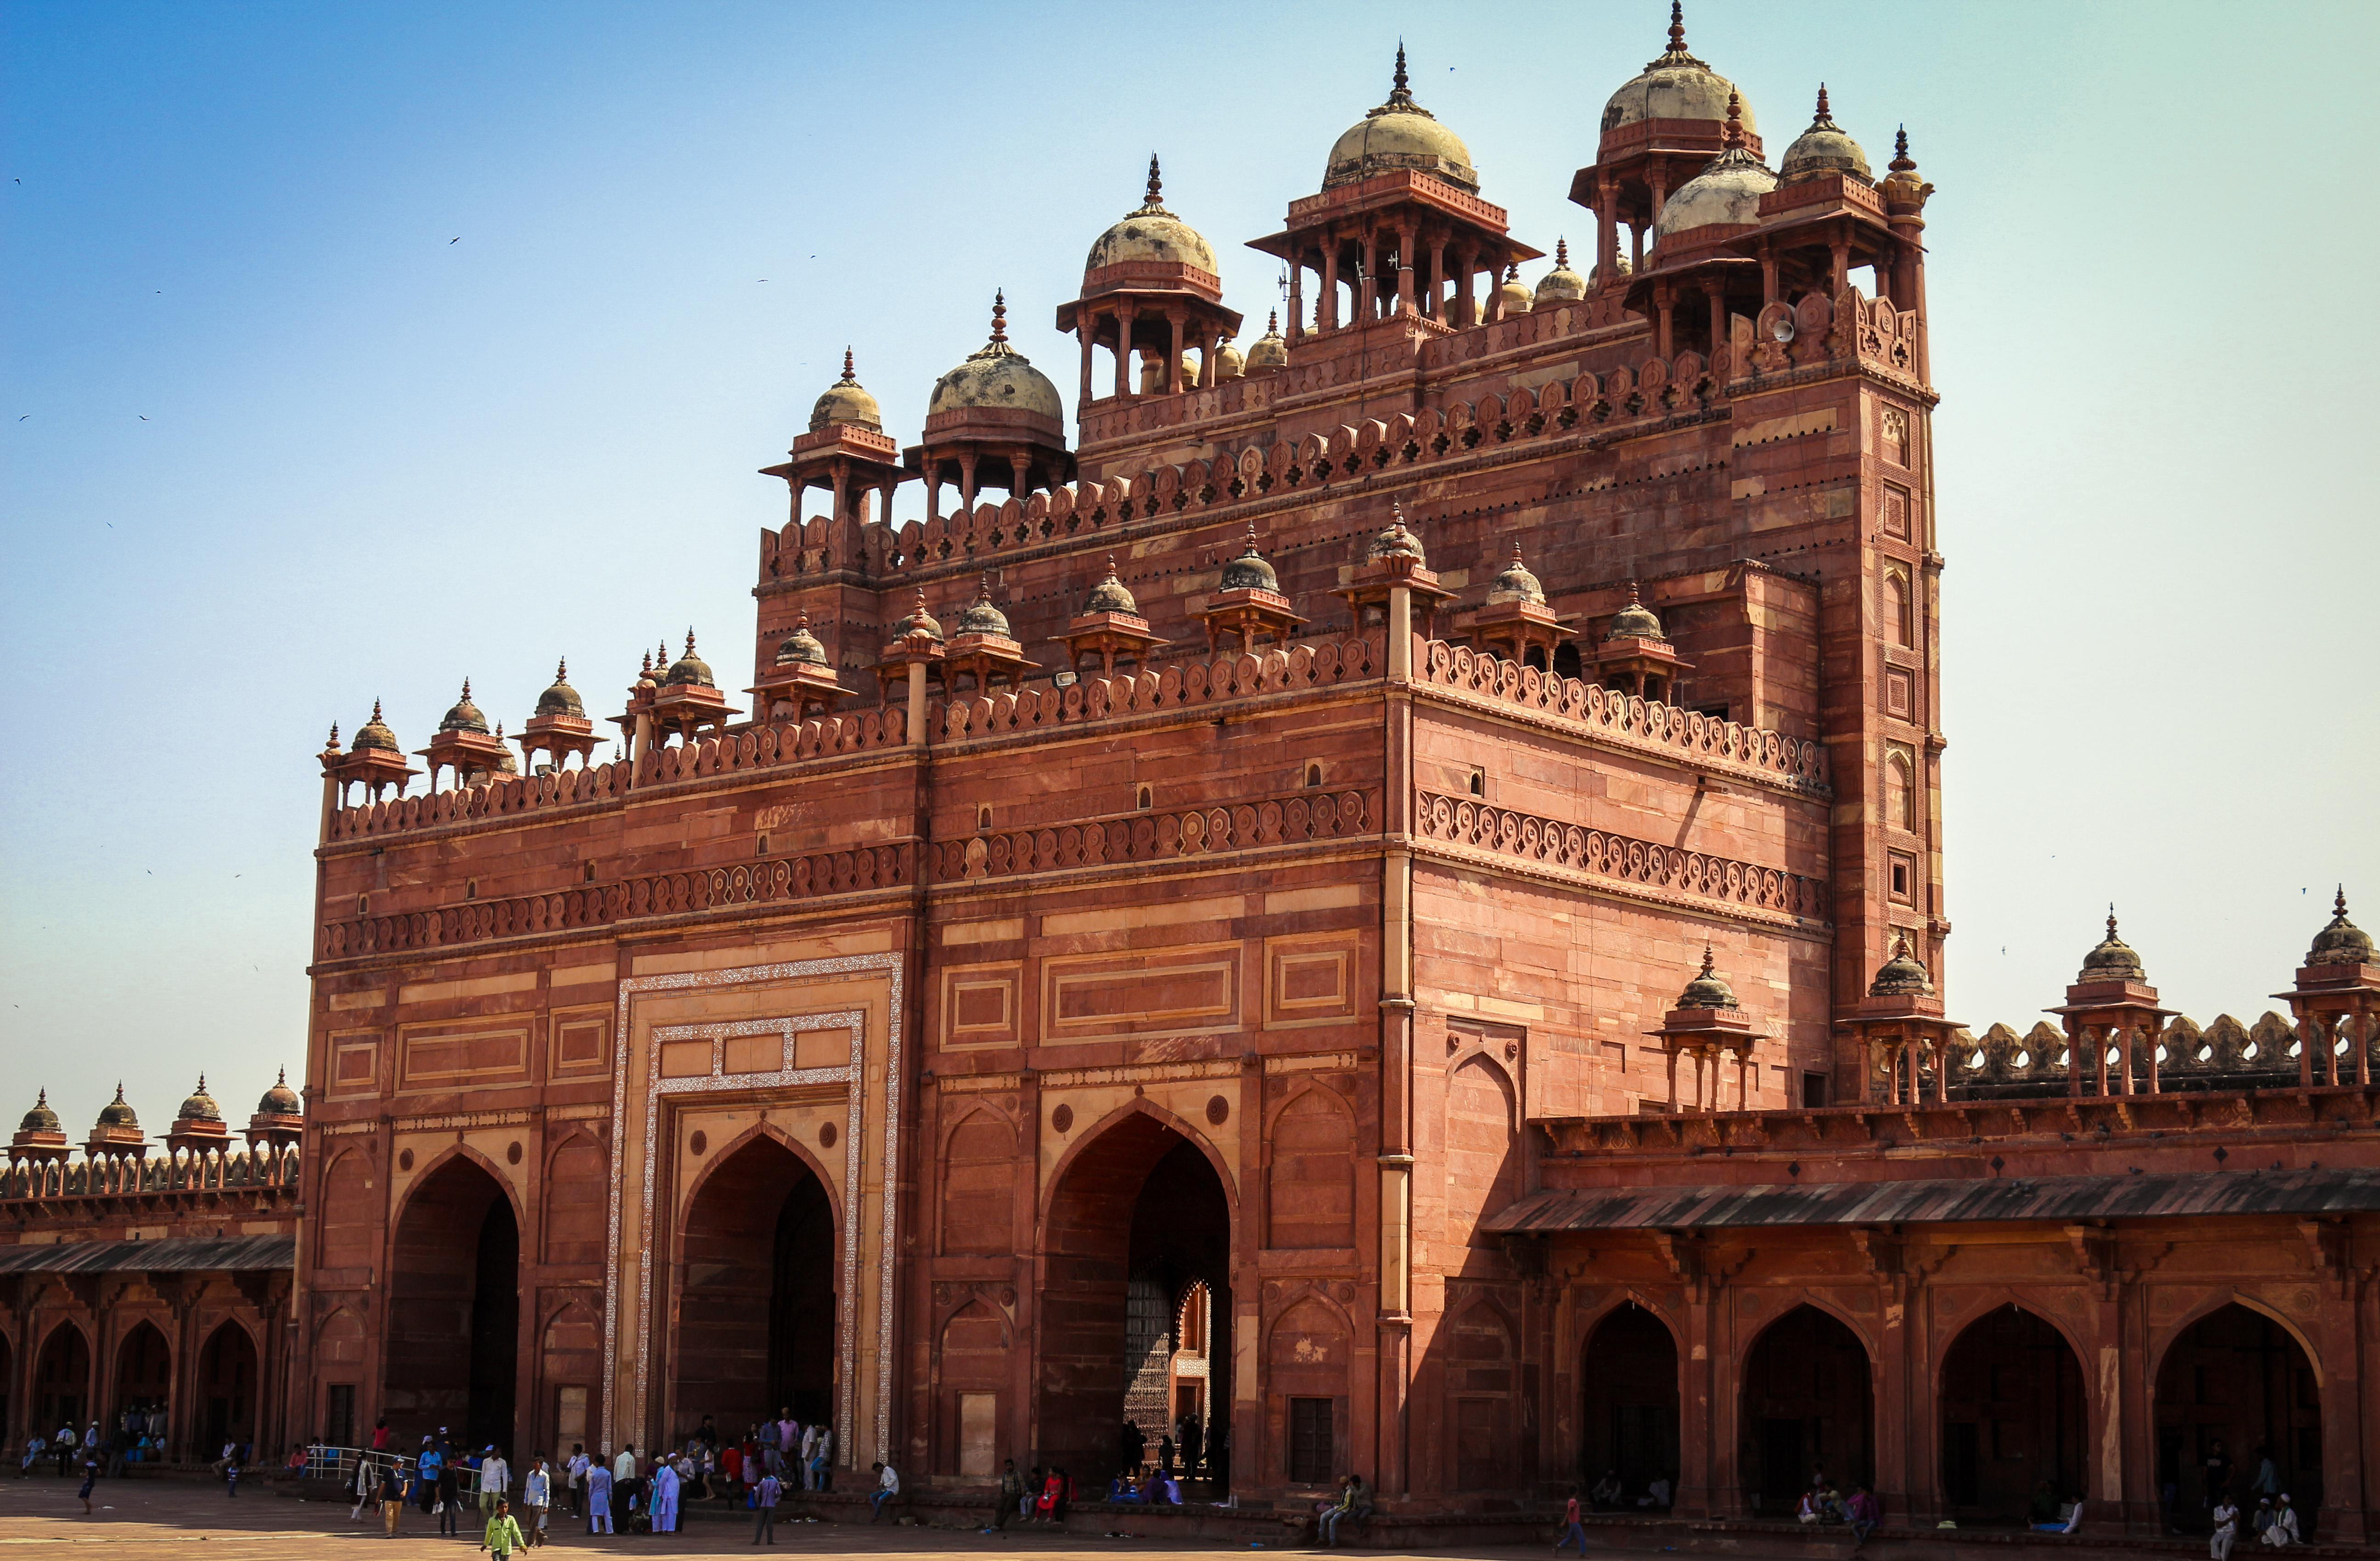 Fatehpur-Sikri, la ciudad fantasma - India Gran Viaje Delhi, Jaipur, Agra